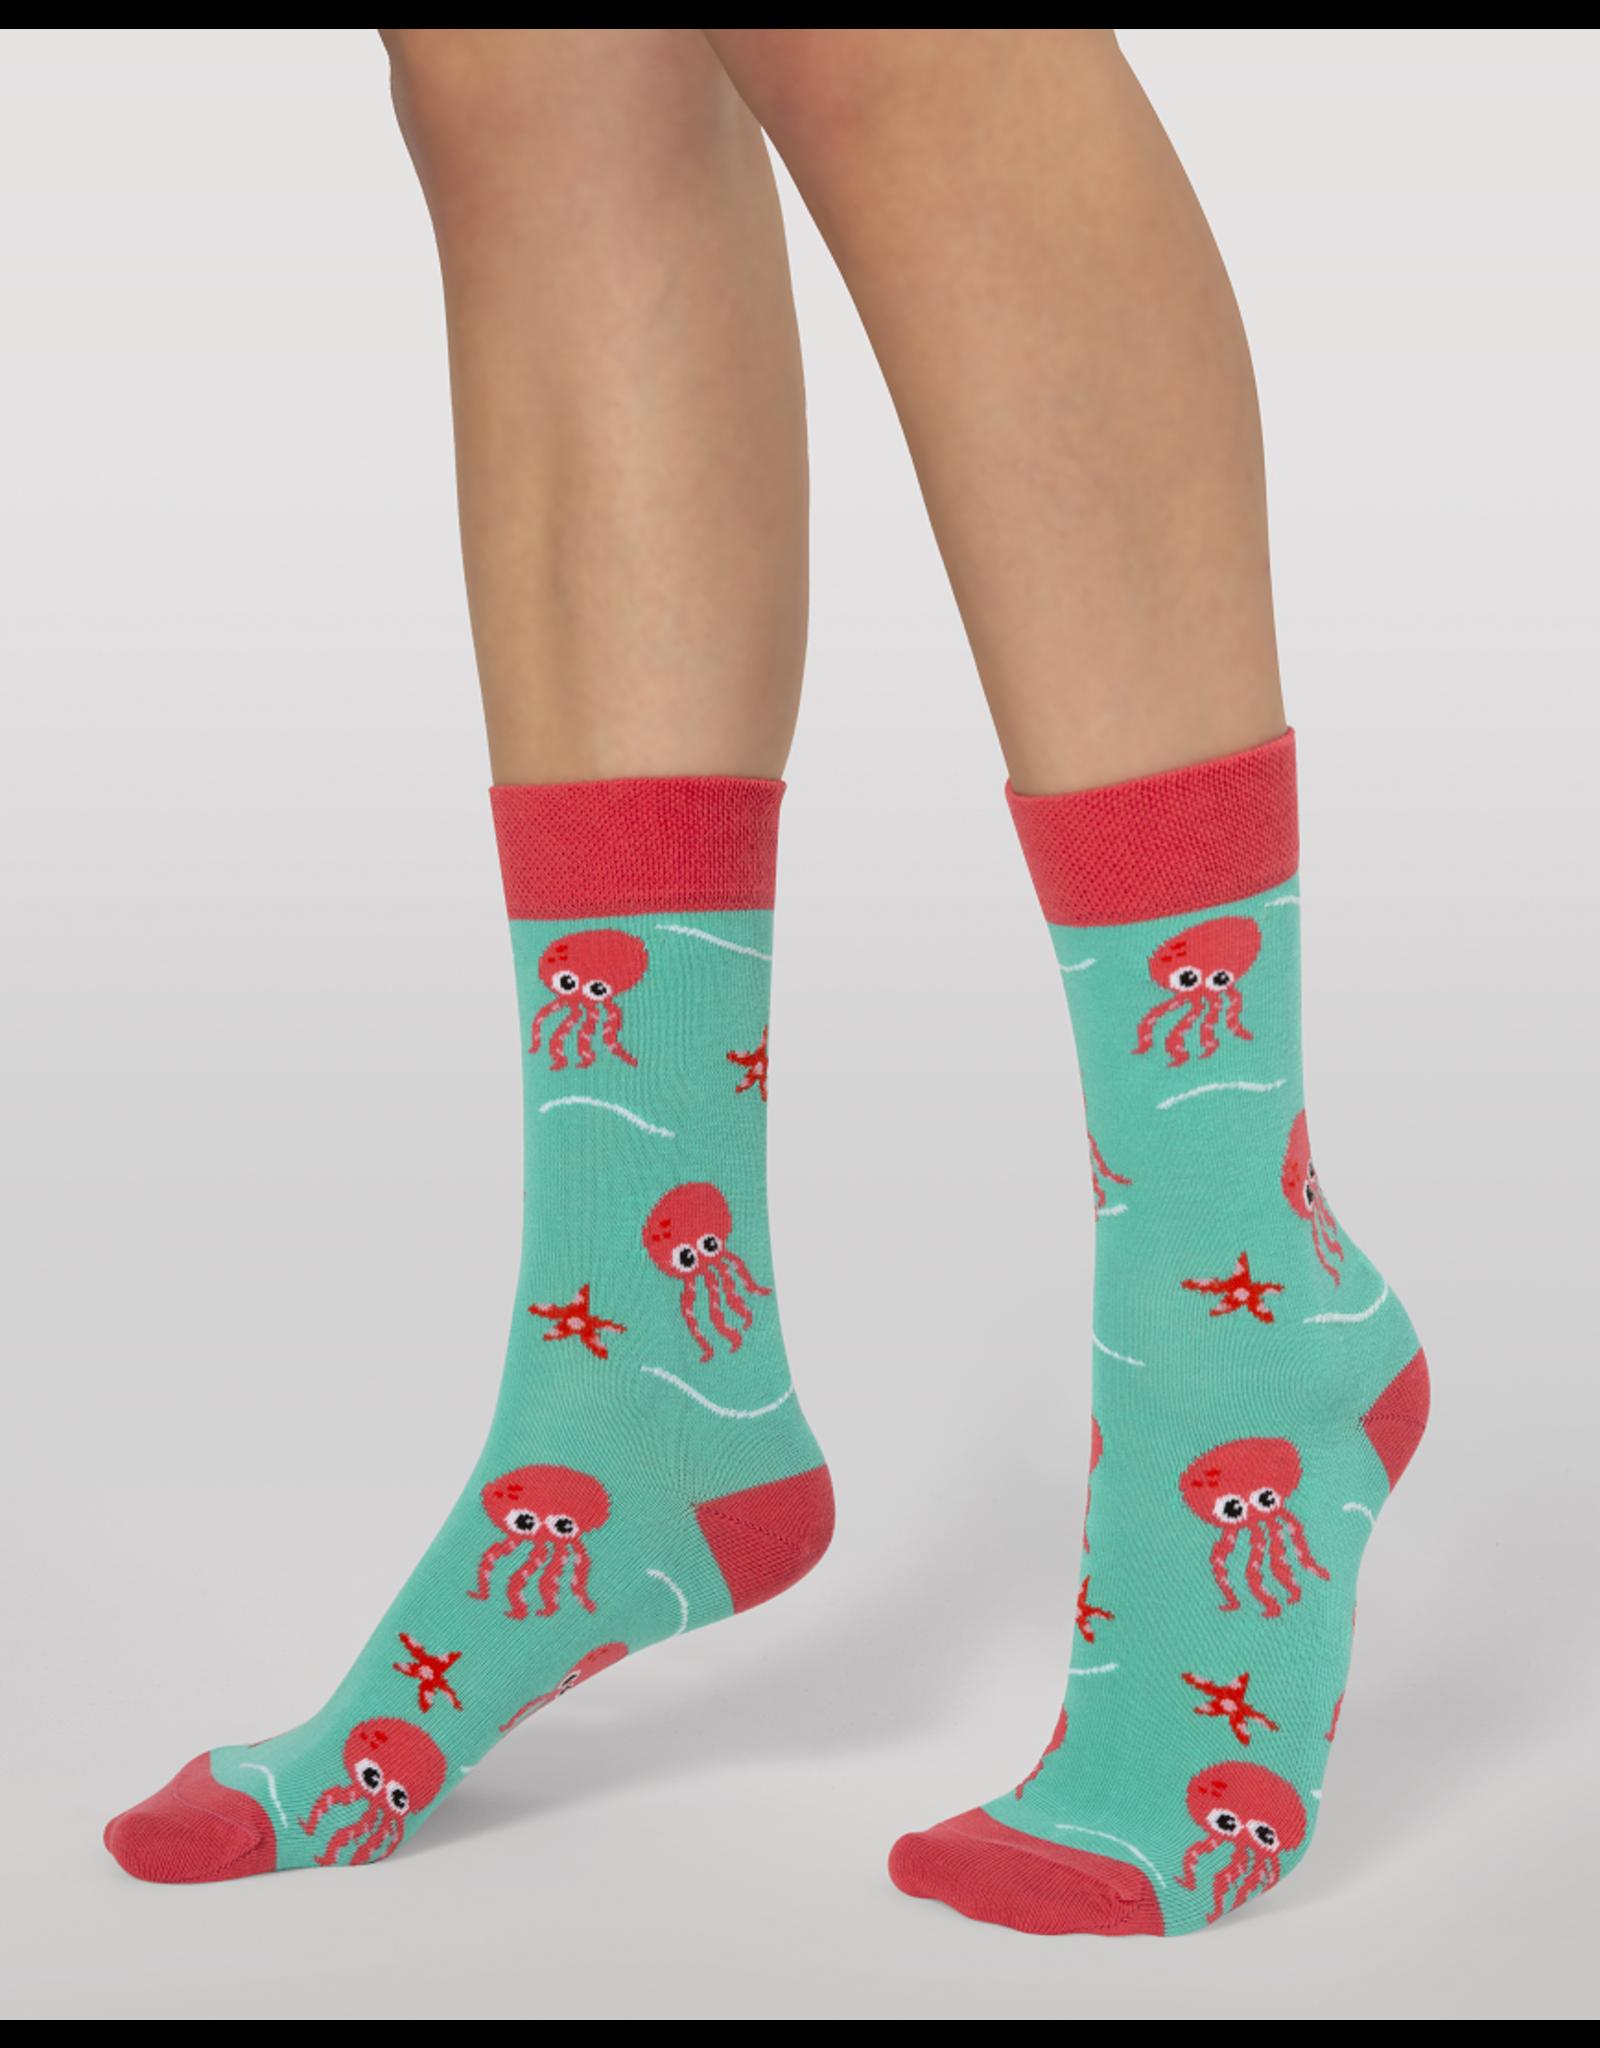 Moustard socks - octopus (41-46)